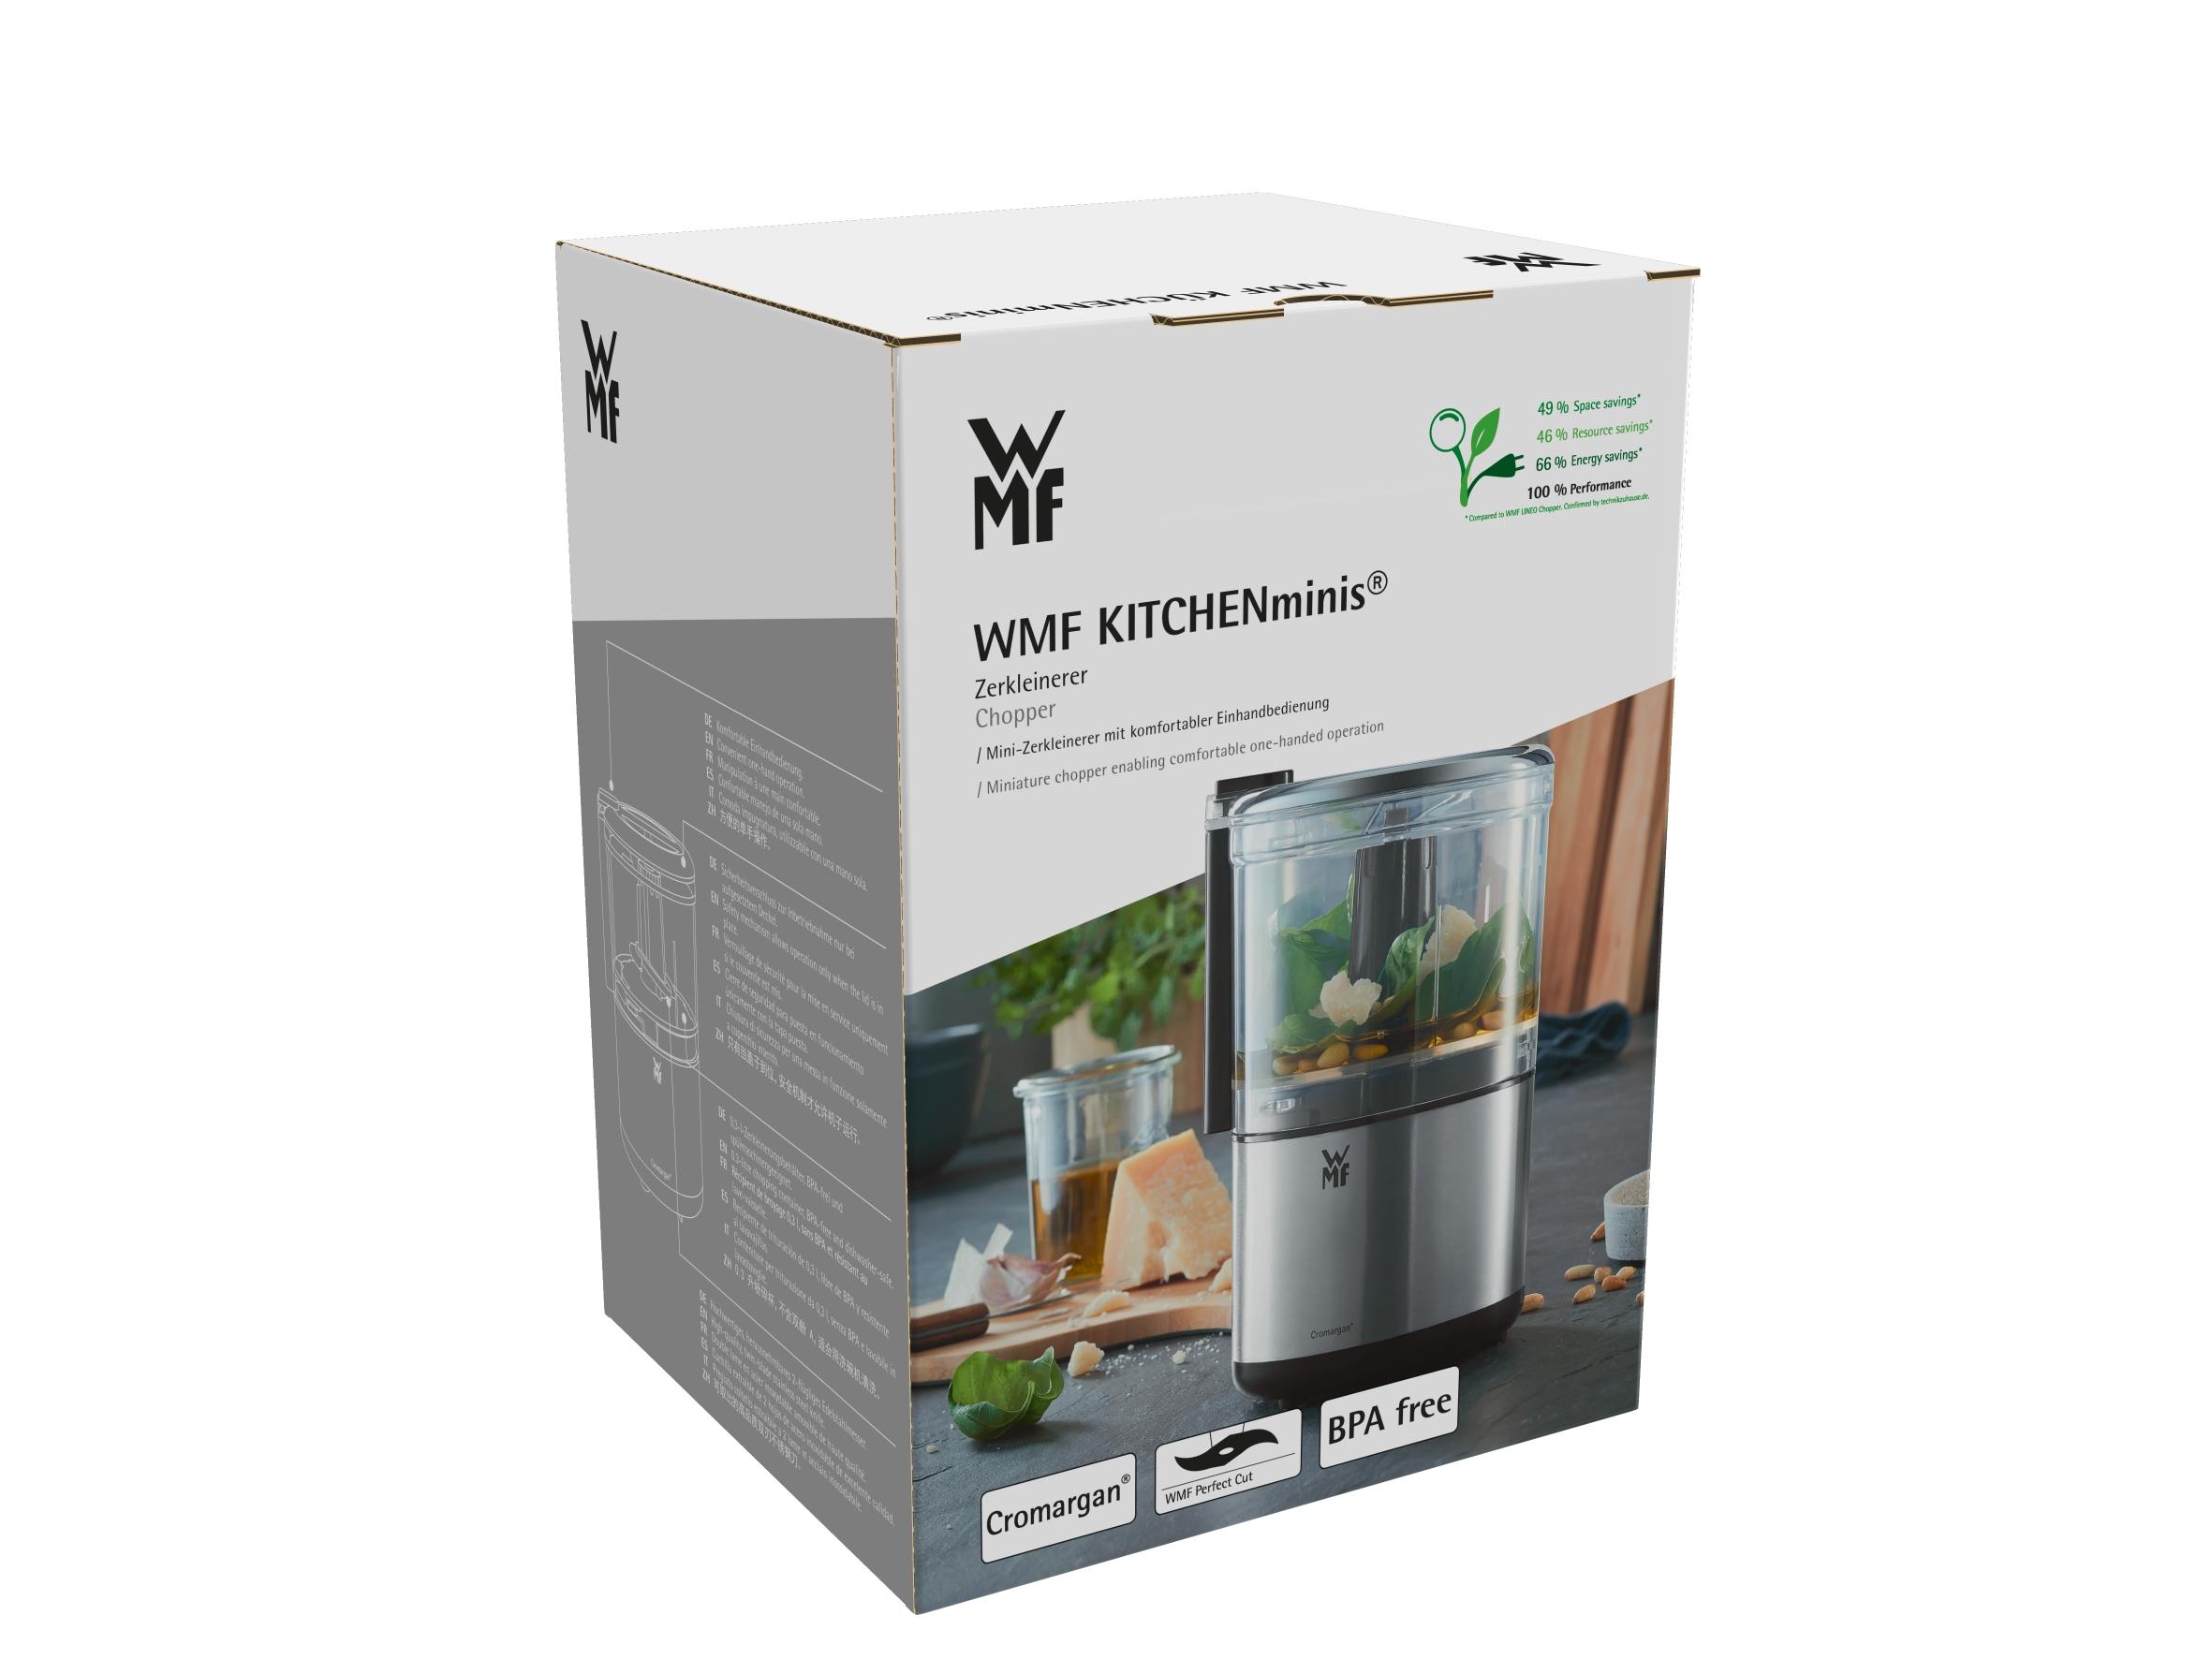 WMF KITCHENminisⓇ Doğrayıcı - 0,3 lt